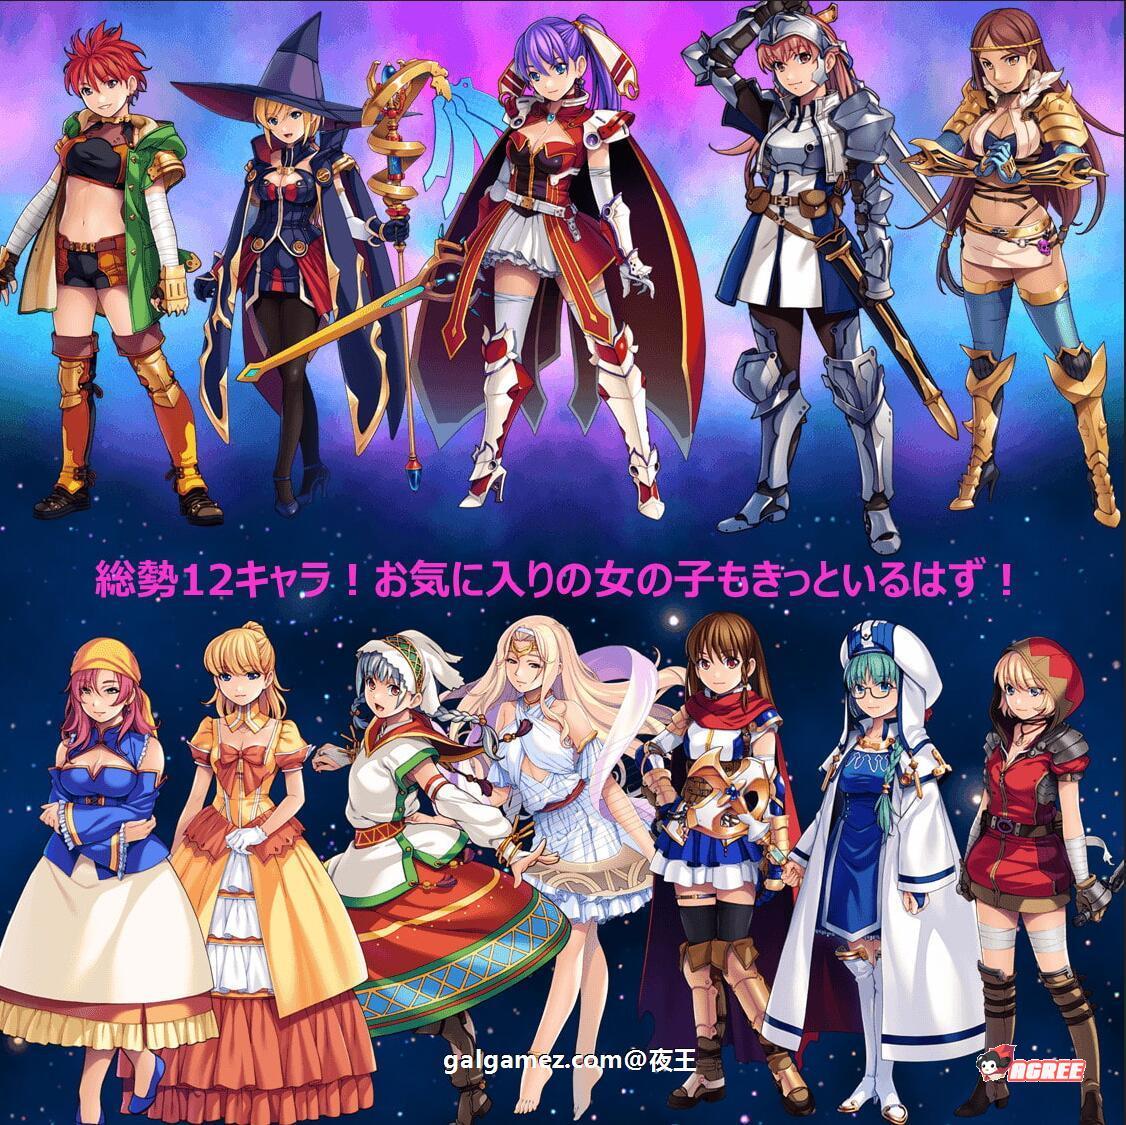 [RPG/汉化]转生!异世界的旅途~V1.12精翻汉化完结版[新汉化/PC+安卓/1.2G] 2